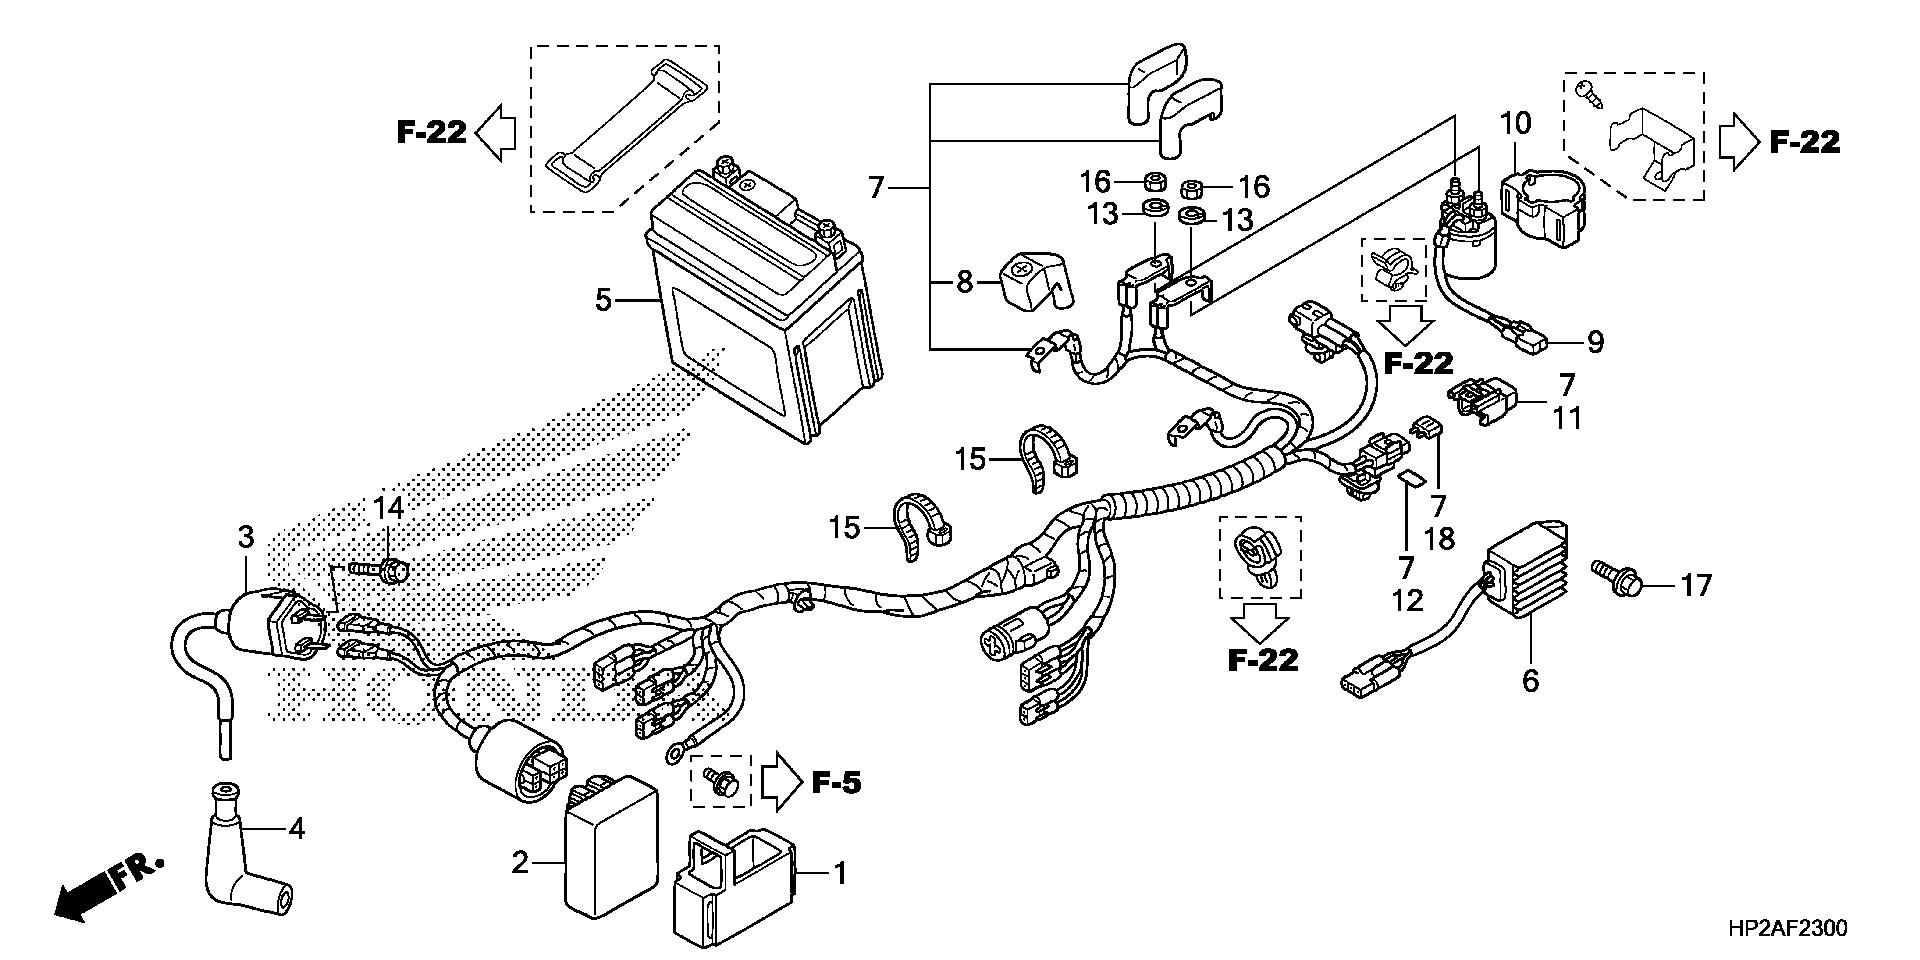 Diagram Of Honda Atv Parts 2000 Trx90 A Wire Harness Diagram